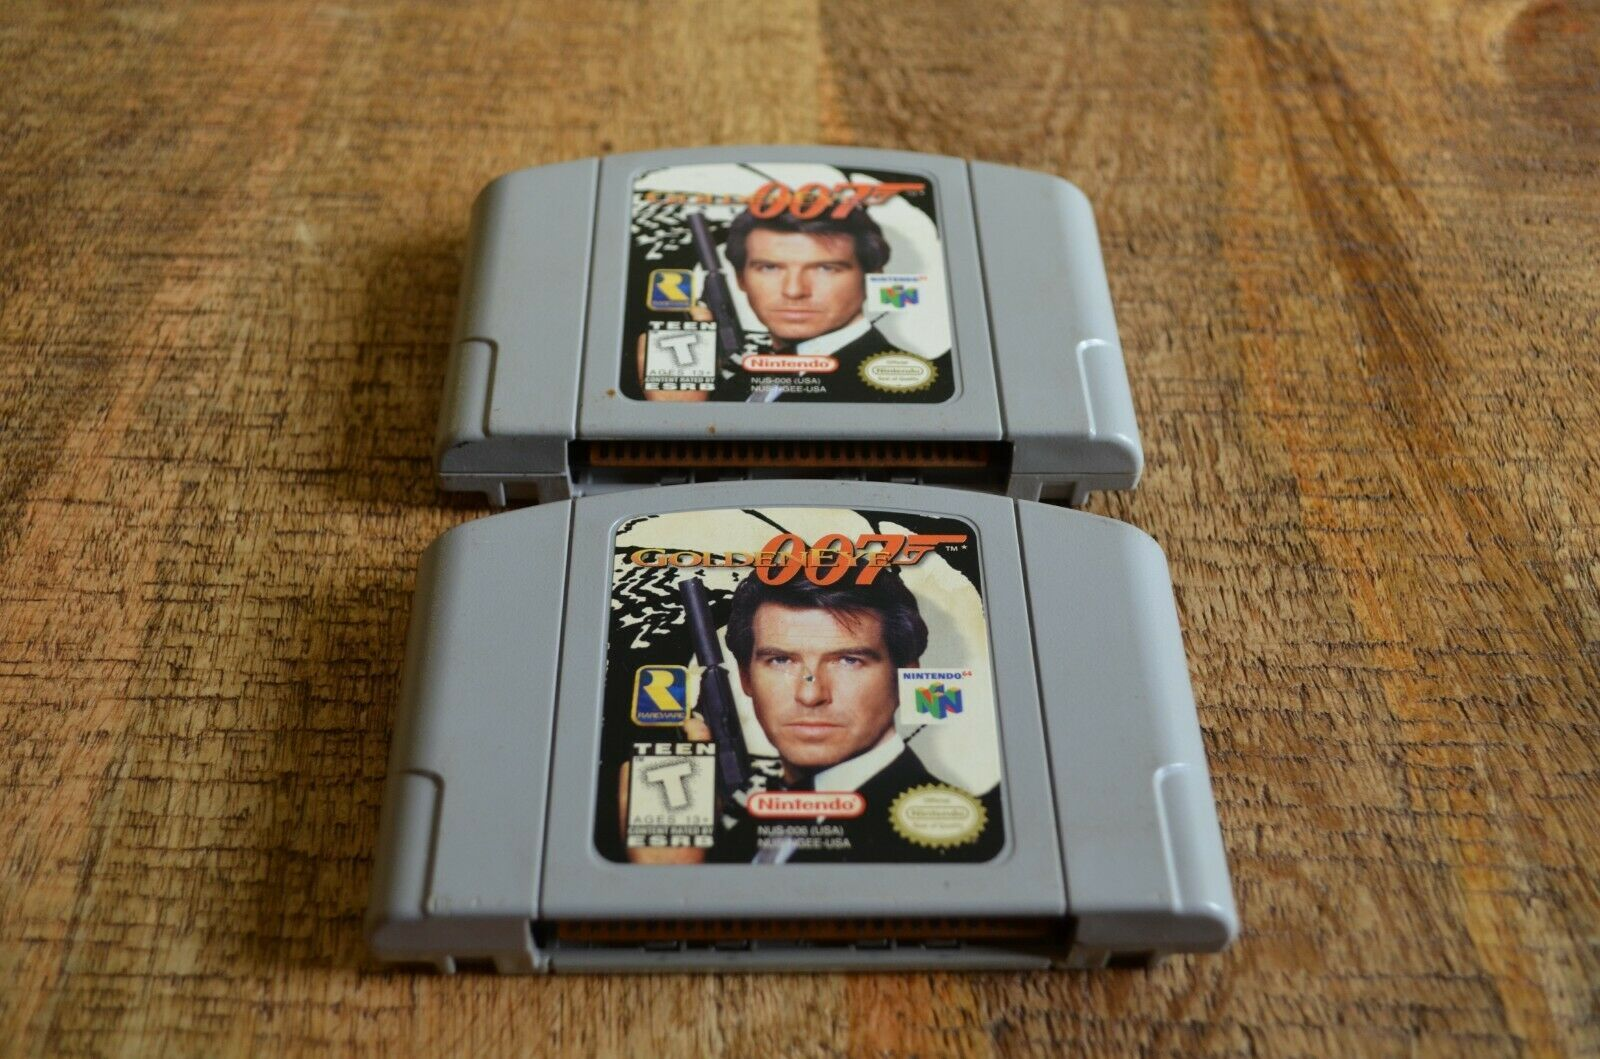 GoldenEye 007 by Rareware (Nintendo 64, 1997) N64 Video Game cartridge only